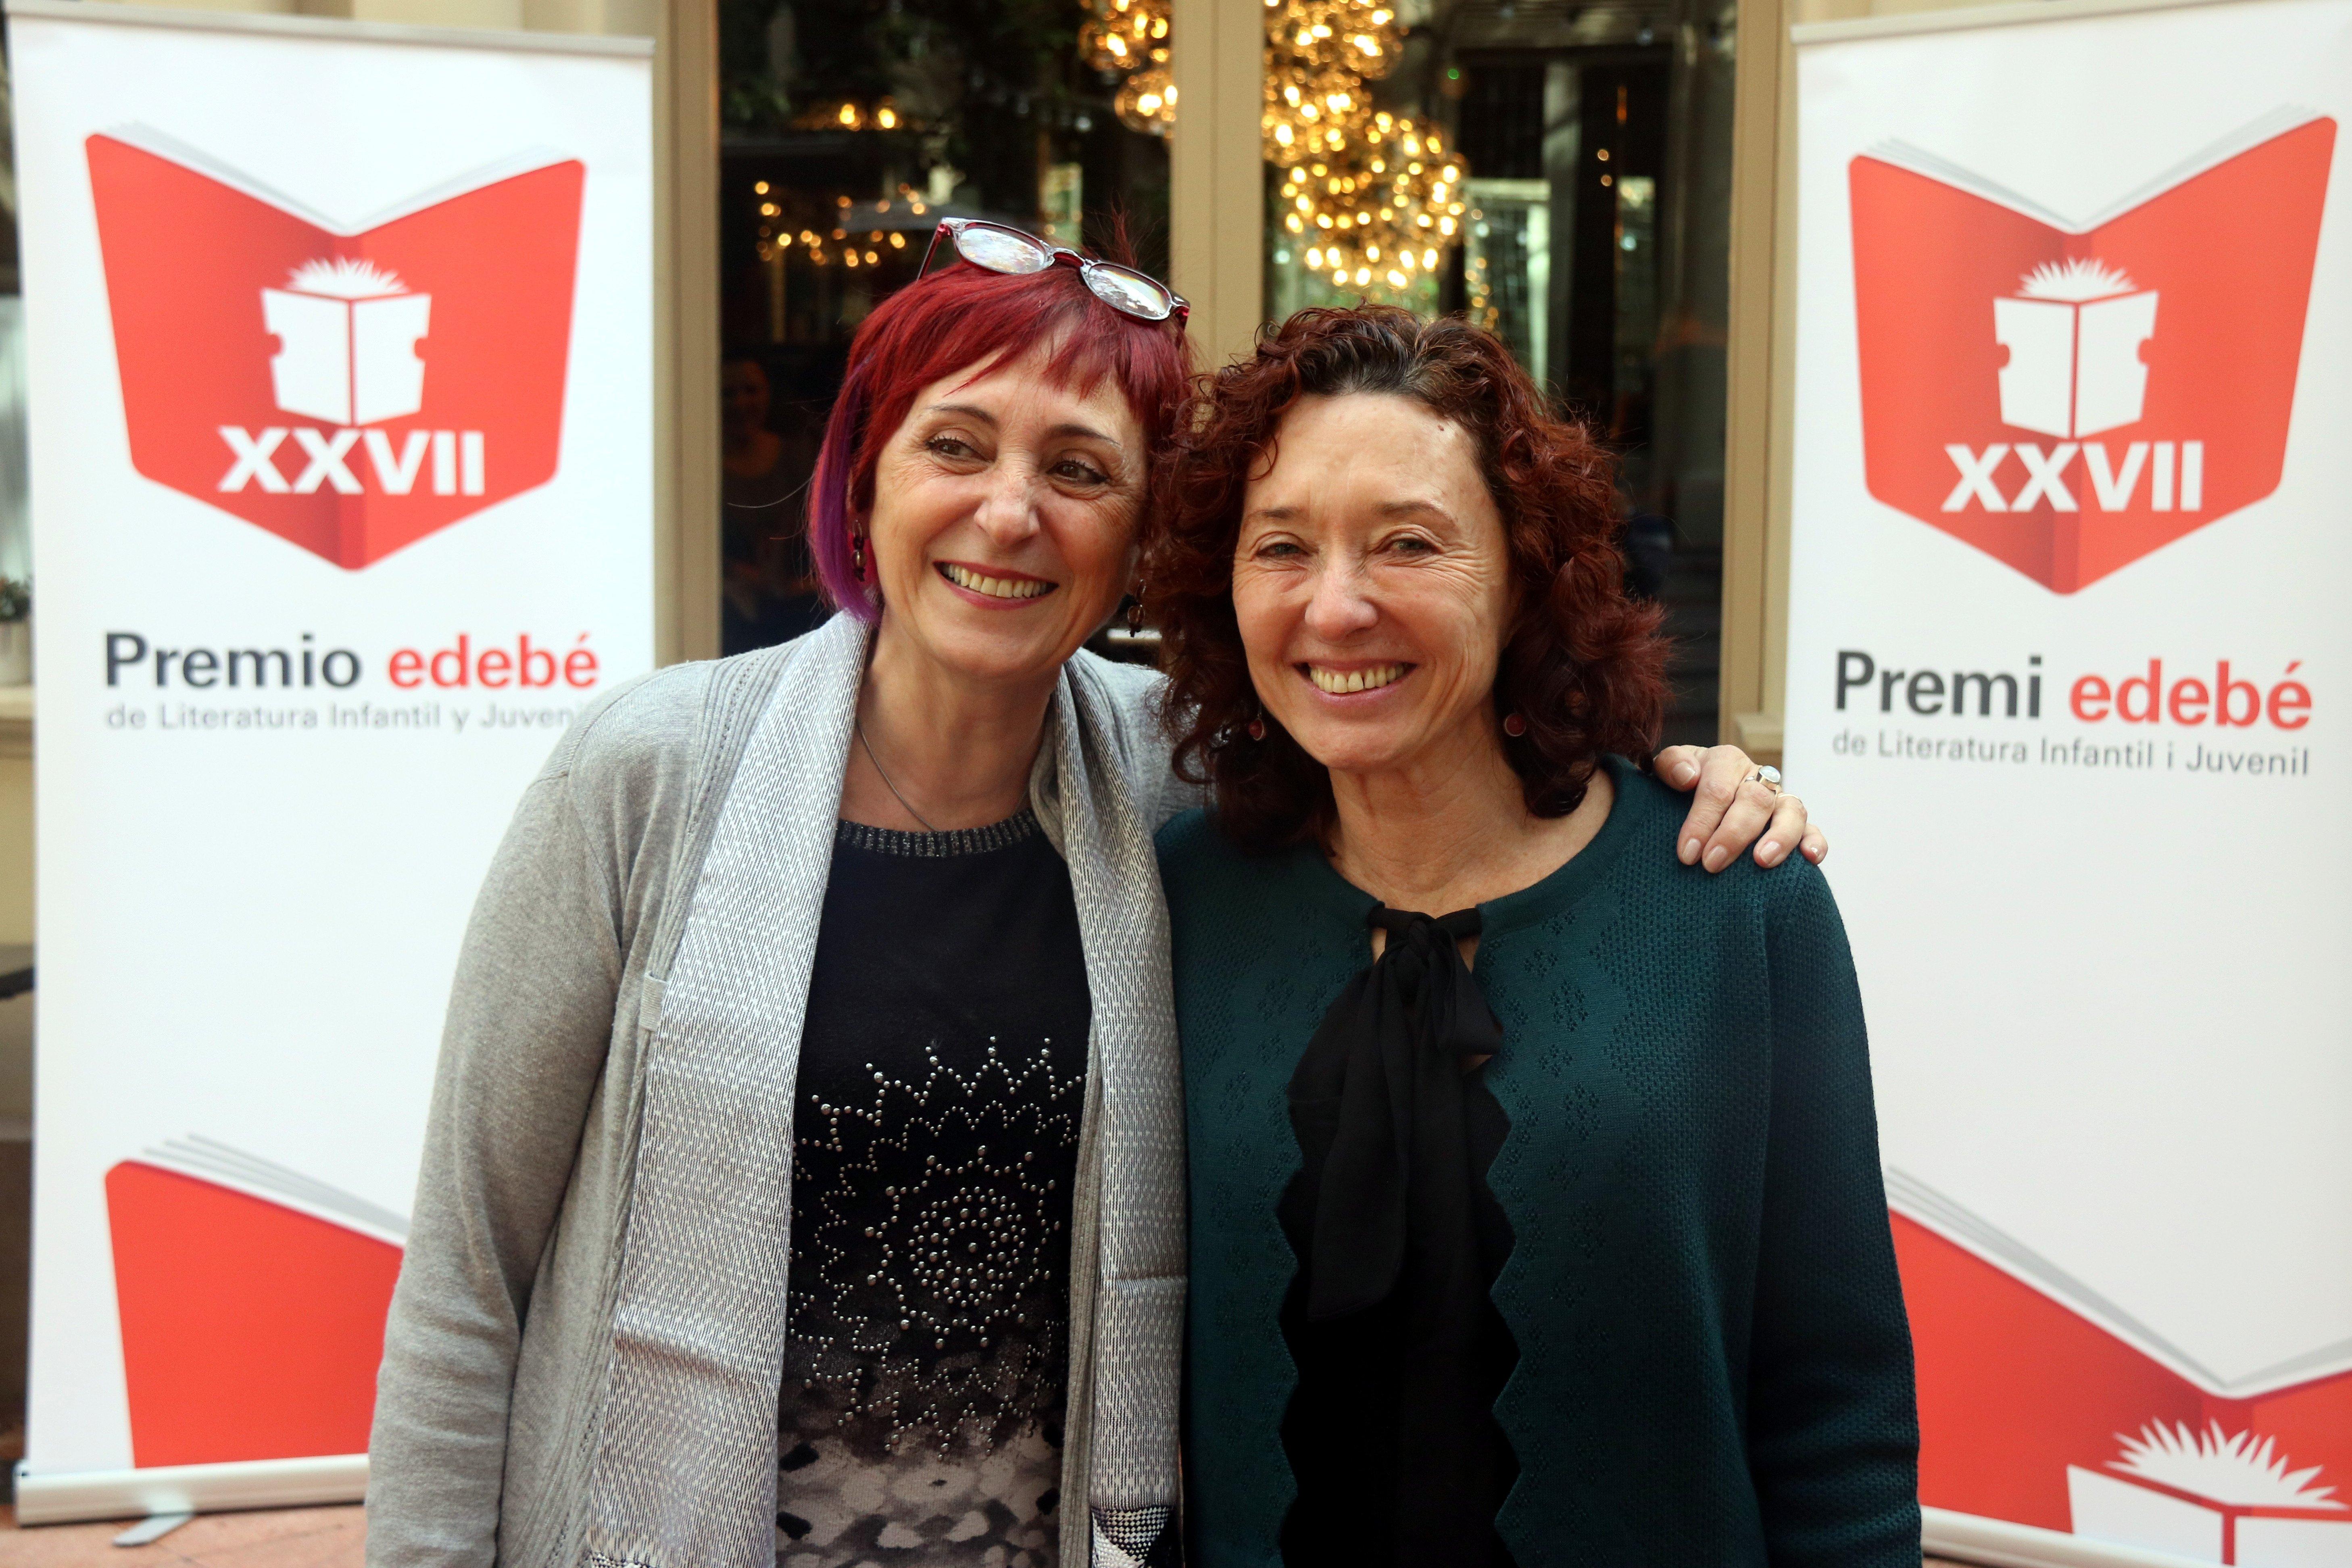 Premi Edebé Maite Carranza Elia Barcelo ACN